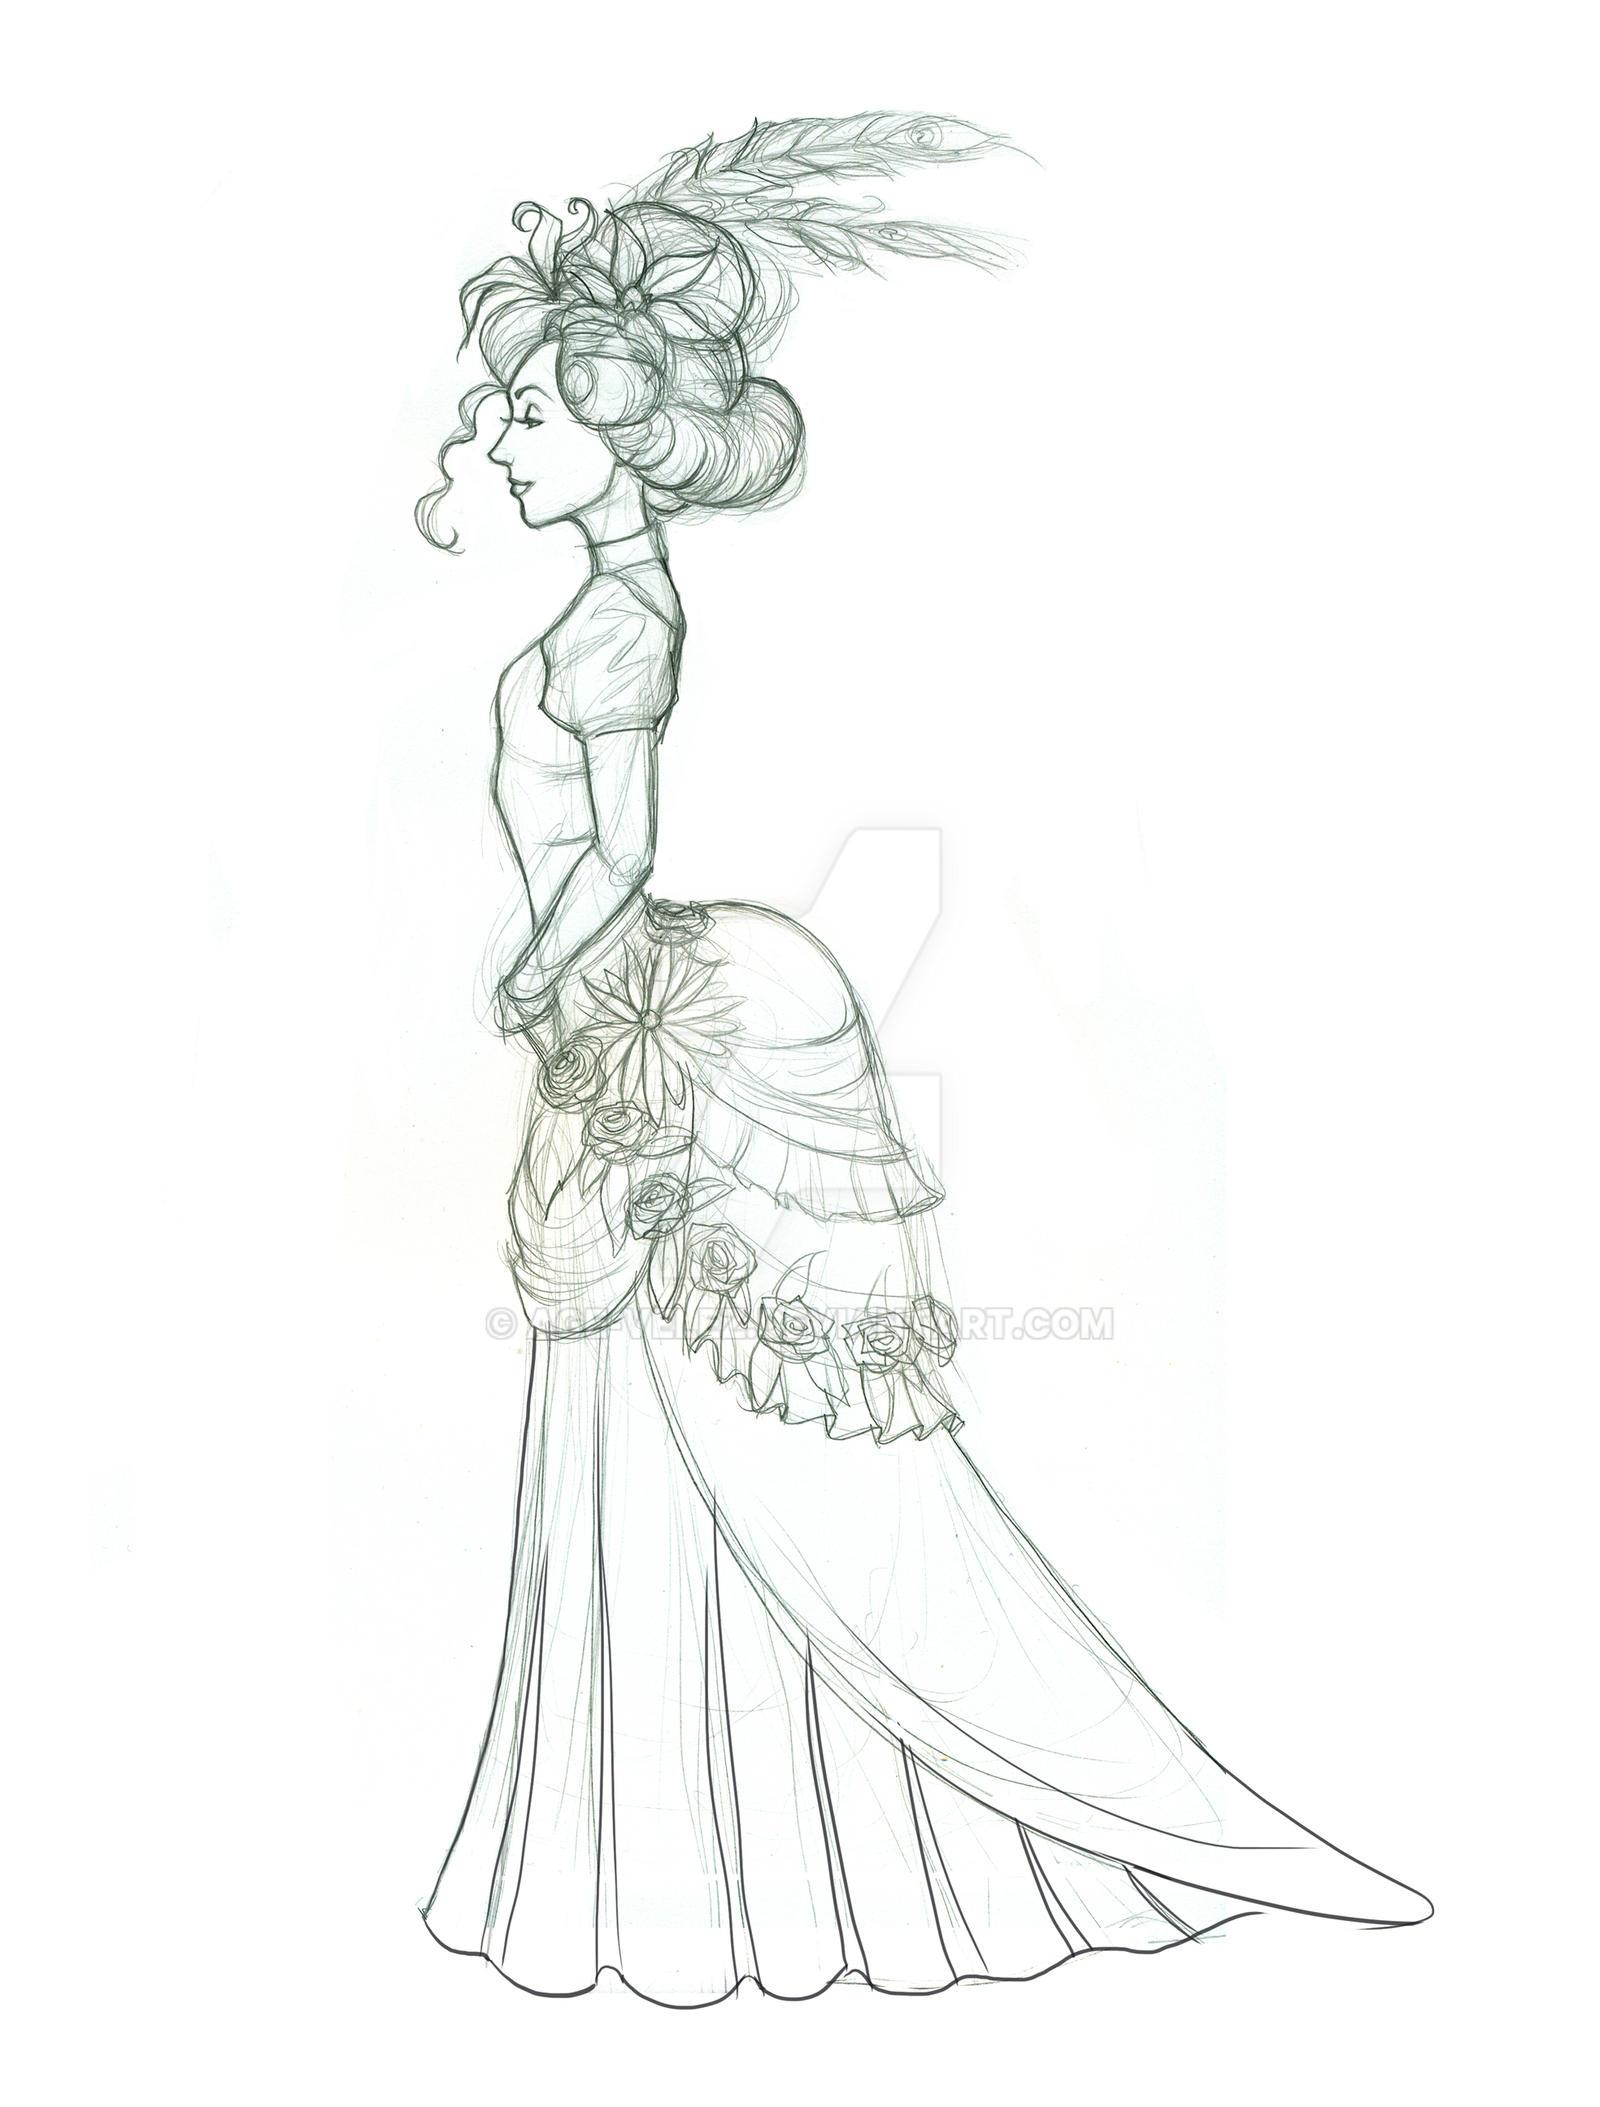 Elizaveta WIP by Age-Velez